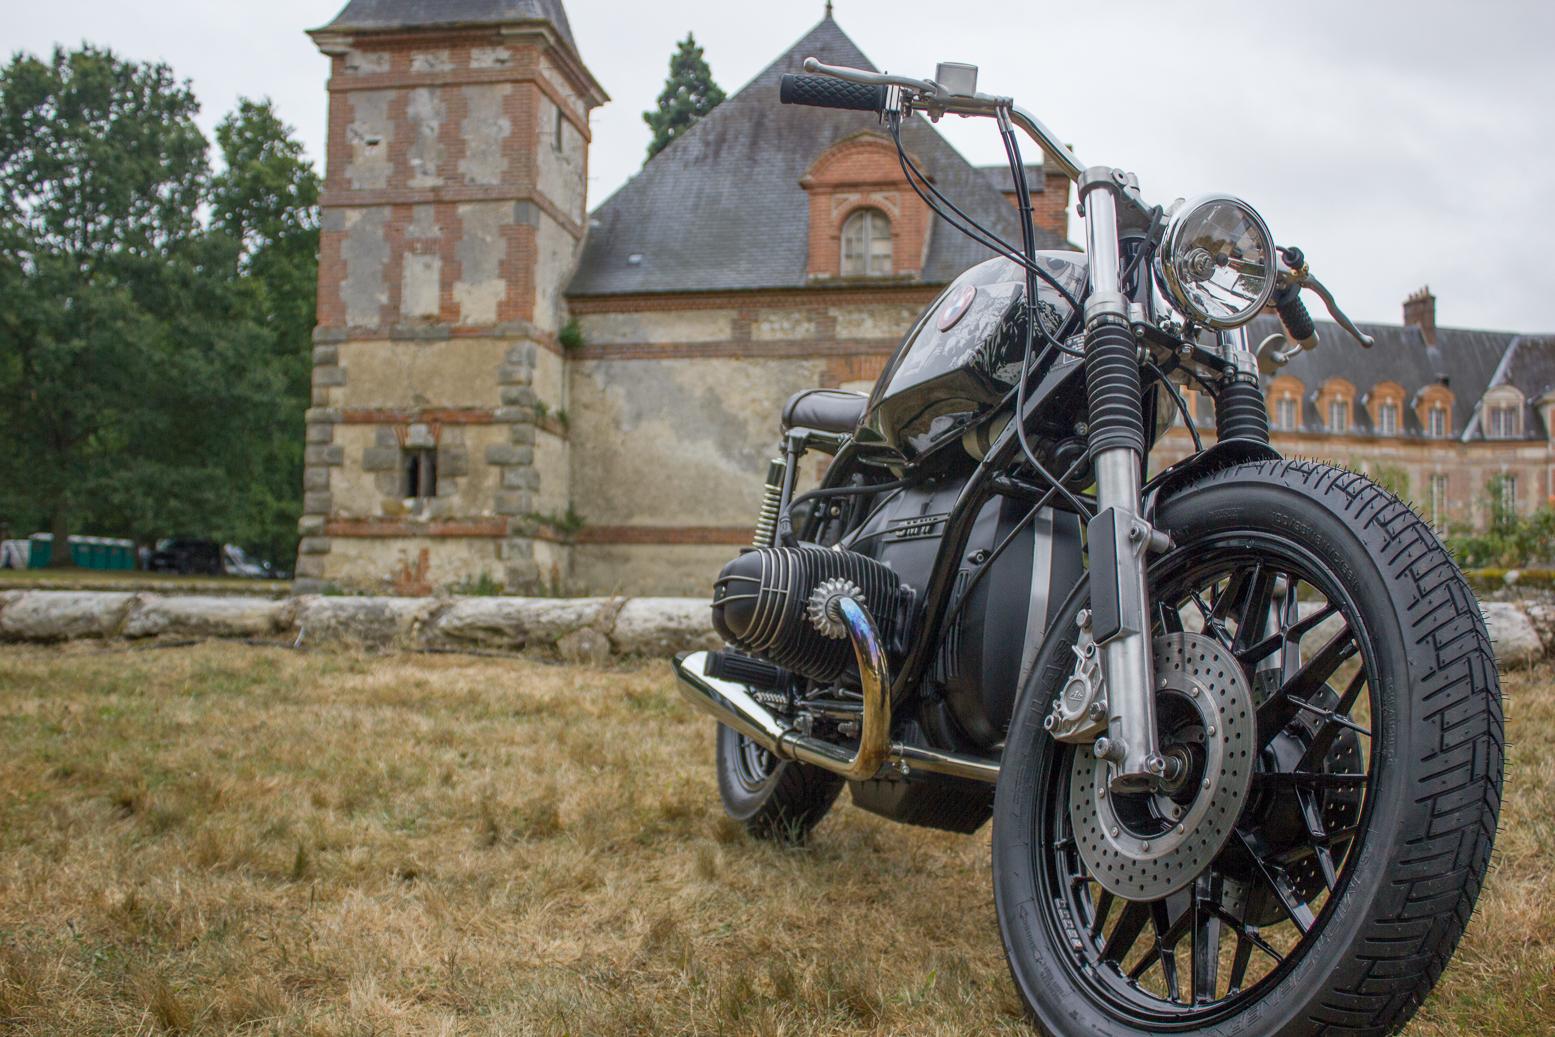 Etik Motorcycles